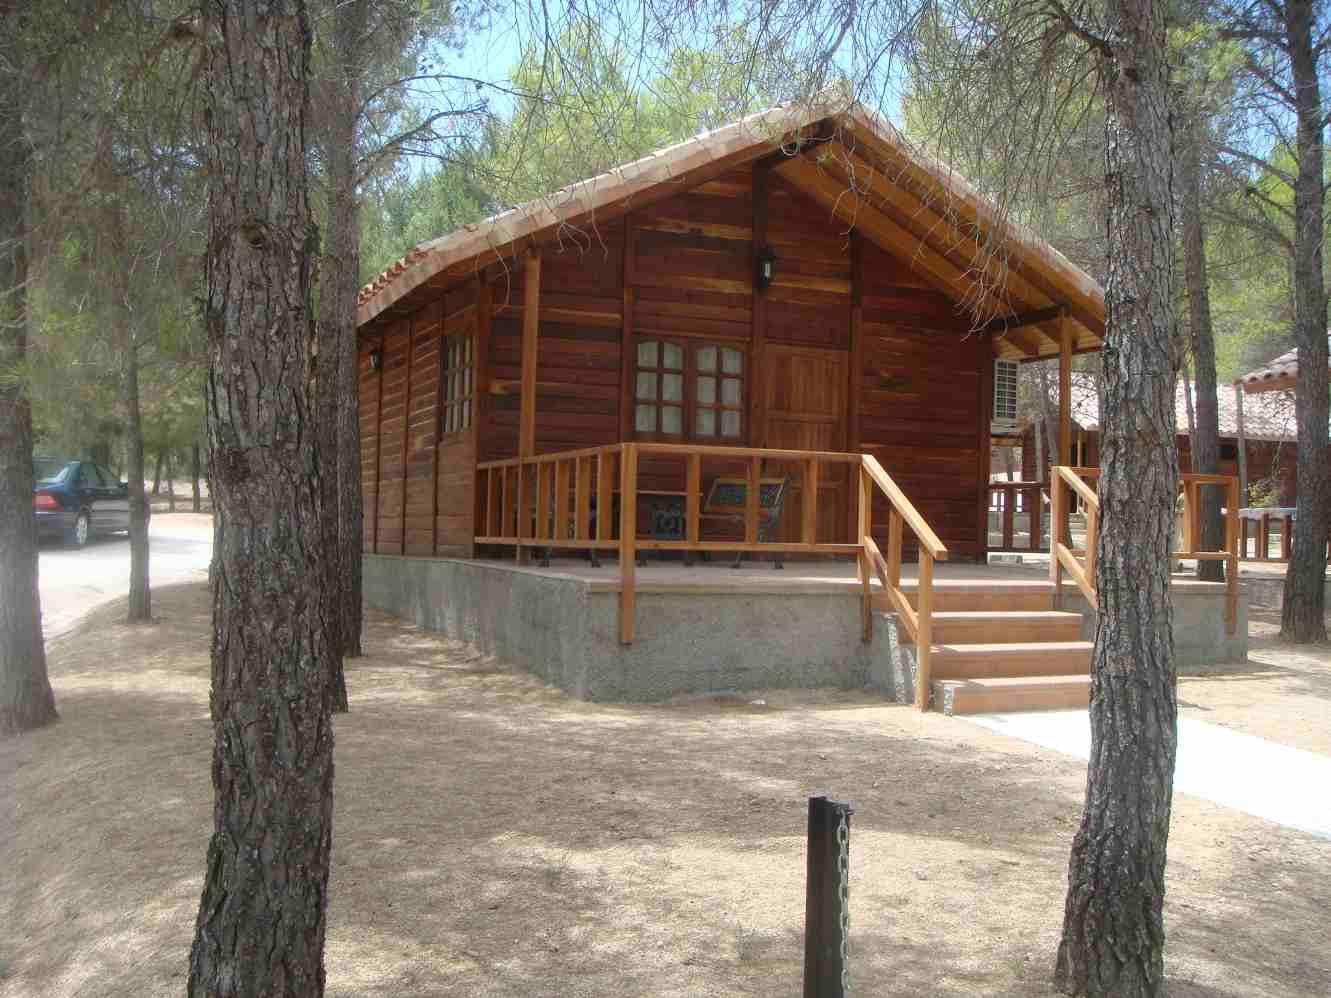 Casas rurales de madera - Casa rural de madera ...